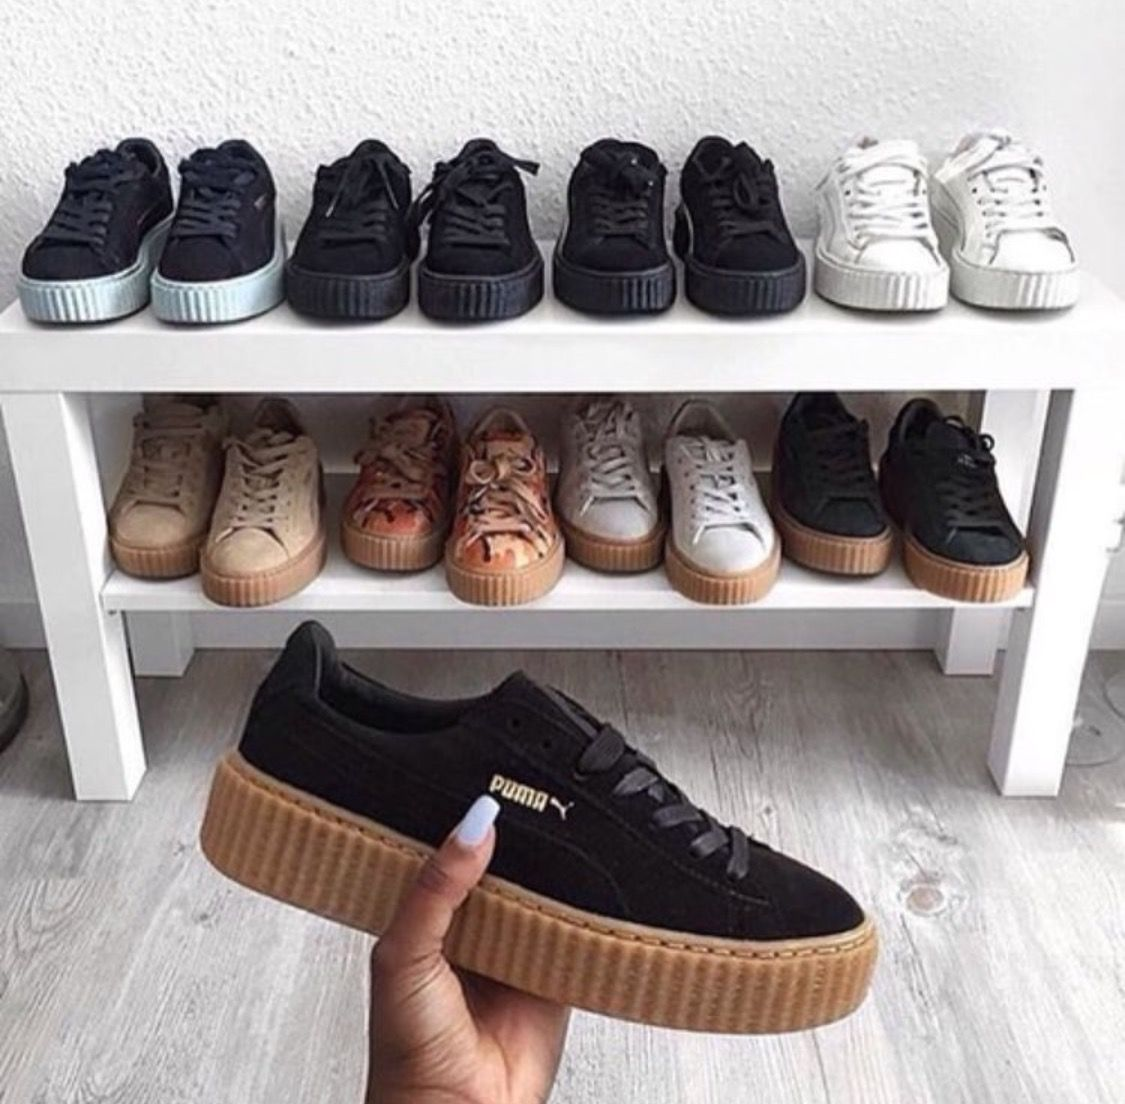 ˏˋoliviakwilsonnˎˊ   Mens puma shoes, Shoes, Sock shoes